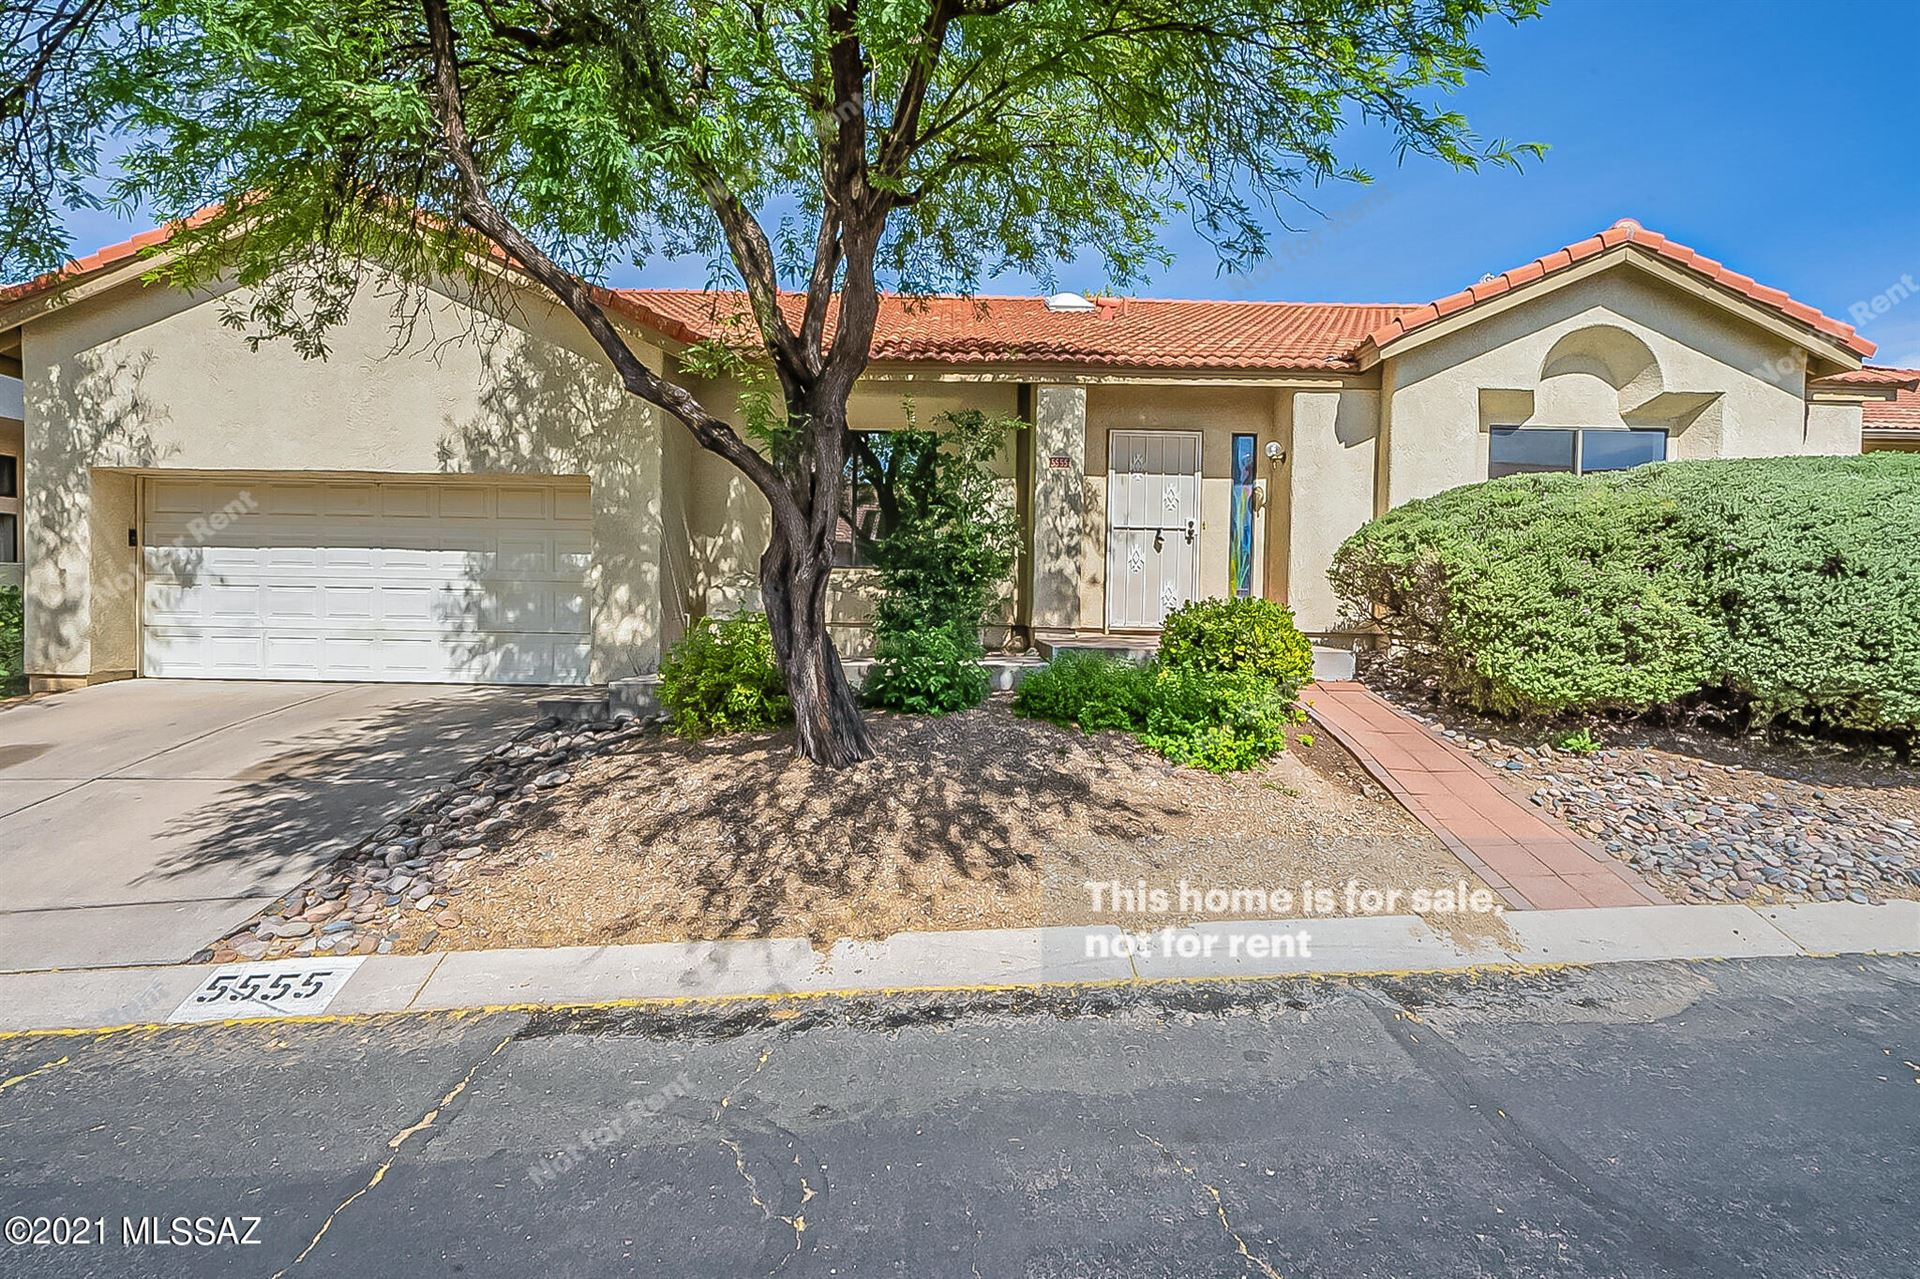 5555 N Waterfield Drive, Tucson, AZ 85750 - MLS#: 22114821